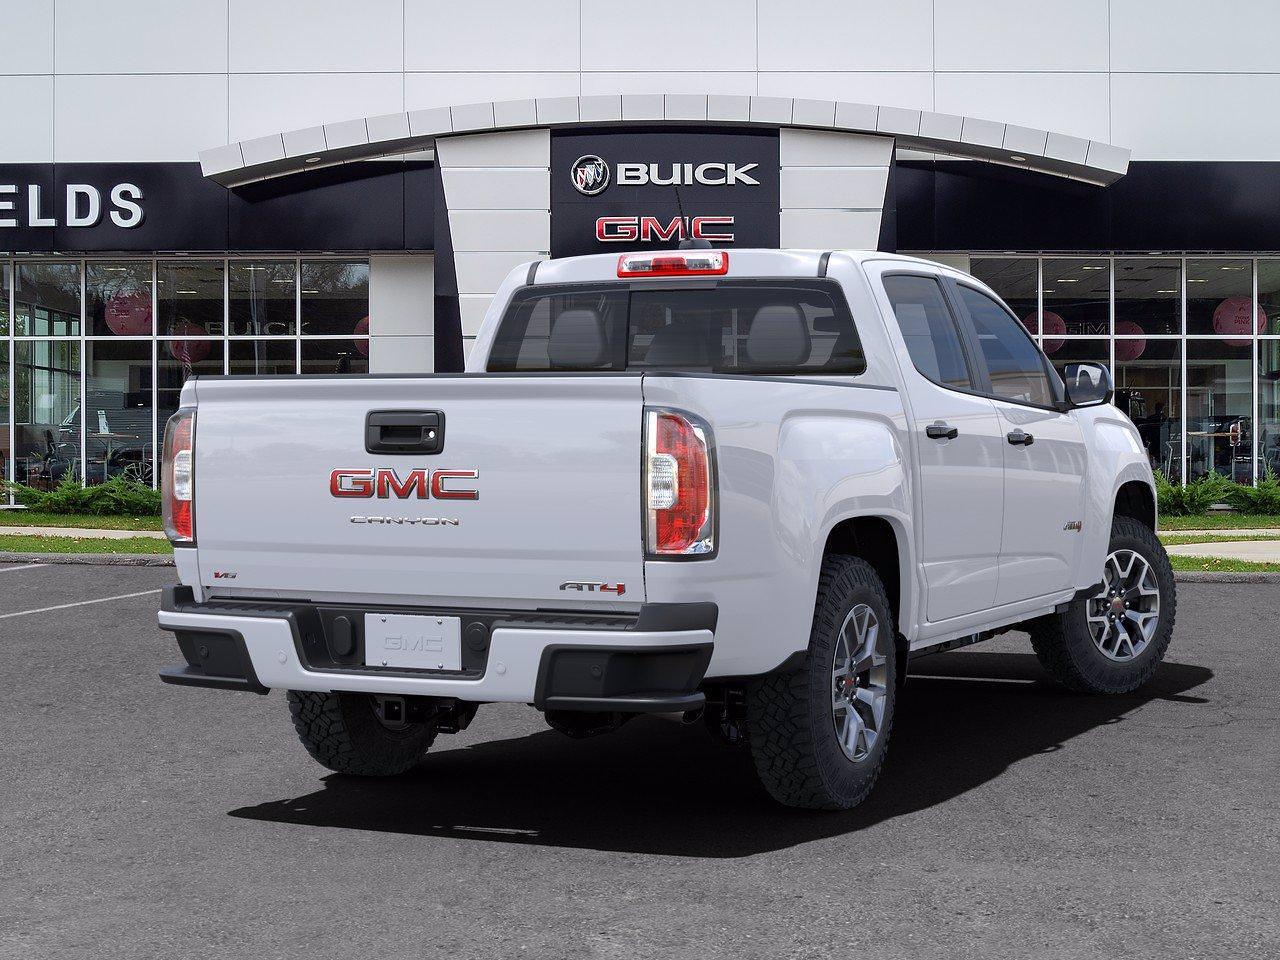 2021 GMC Canyon Crew Cab 4x4, Pickup #G21221 - photo 1